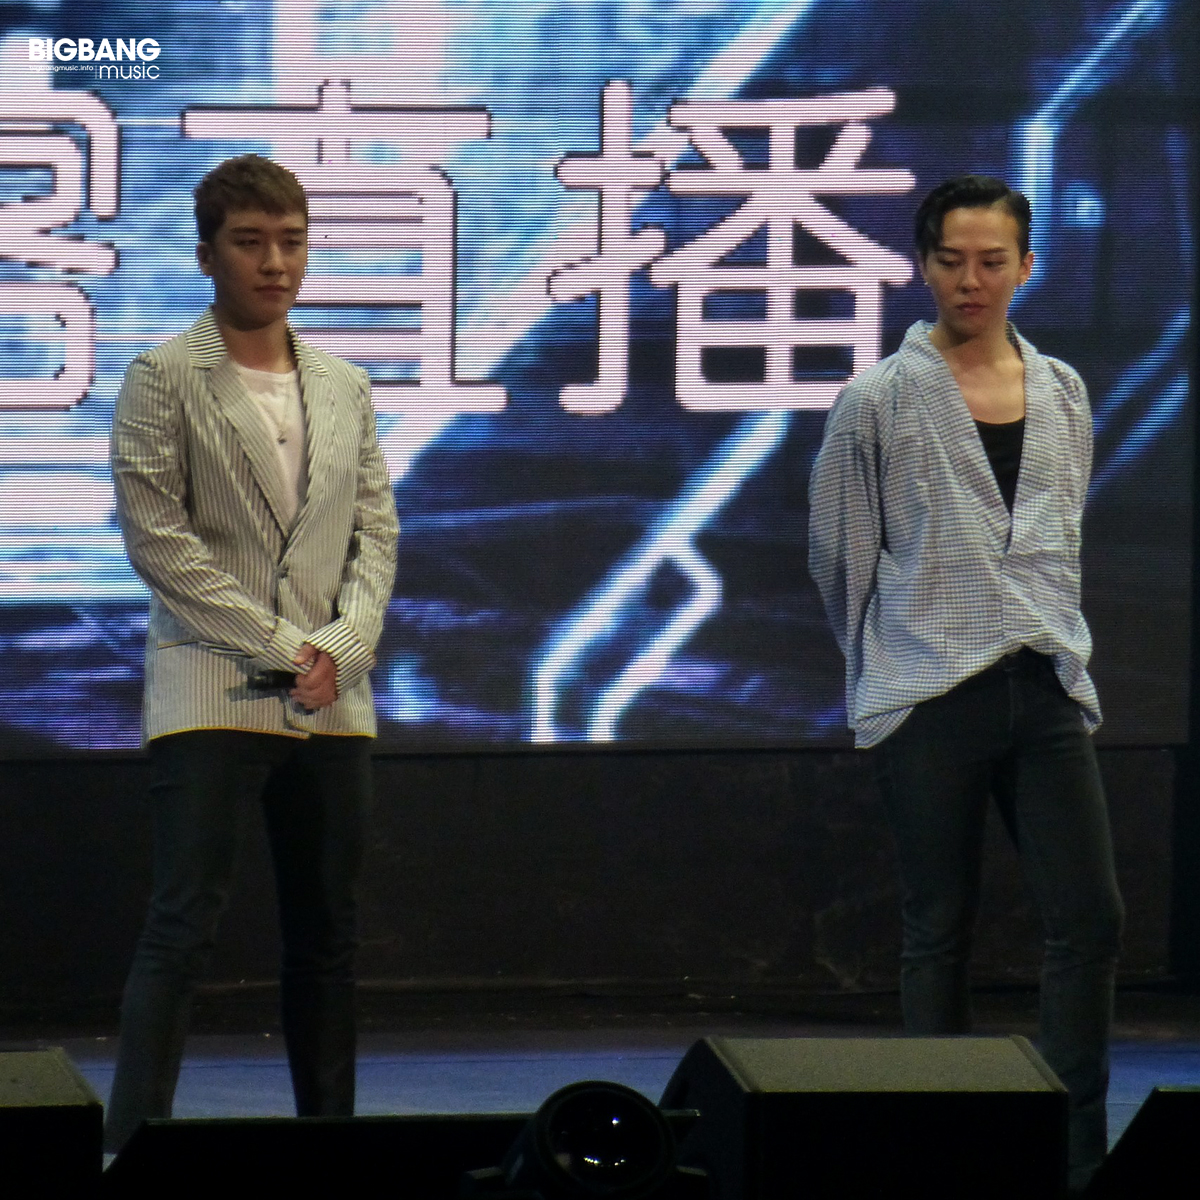 BBMusic-BIGBANG_FM_Beijing_Day3_2016-07-17_02